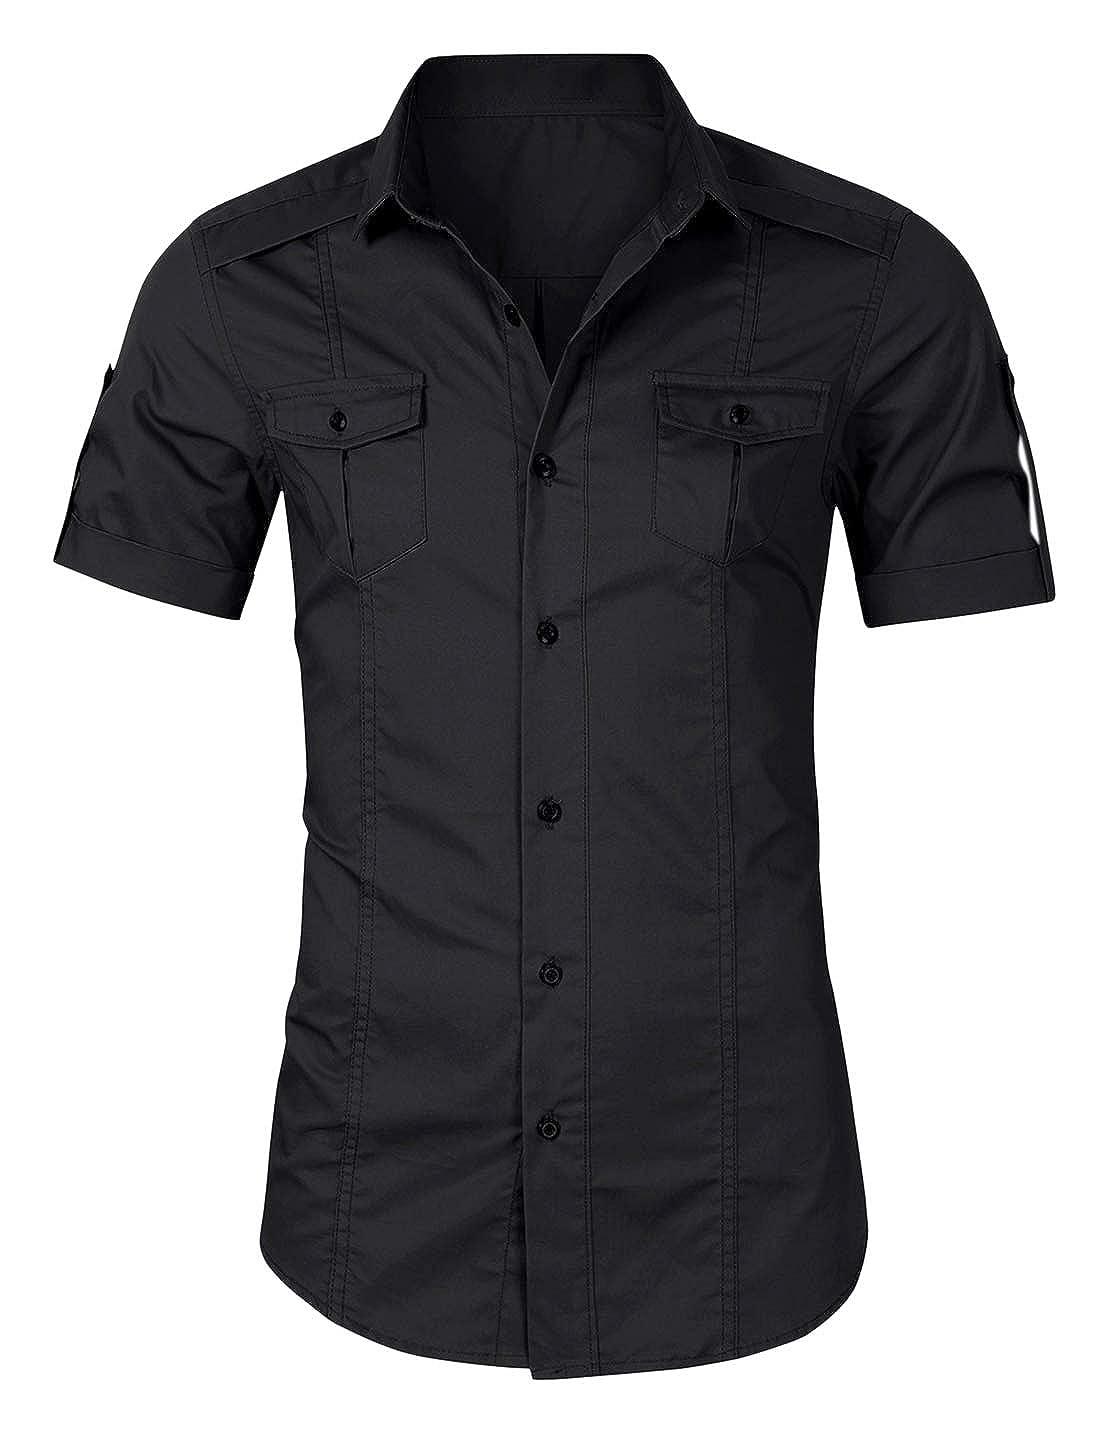 Lentta Mens Military Casual Slim Short Sleeve Shirt Button Up Cargo Work Shirts